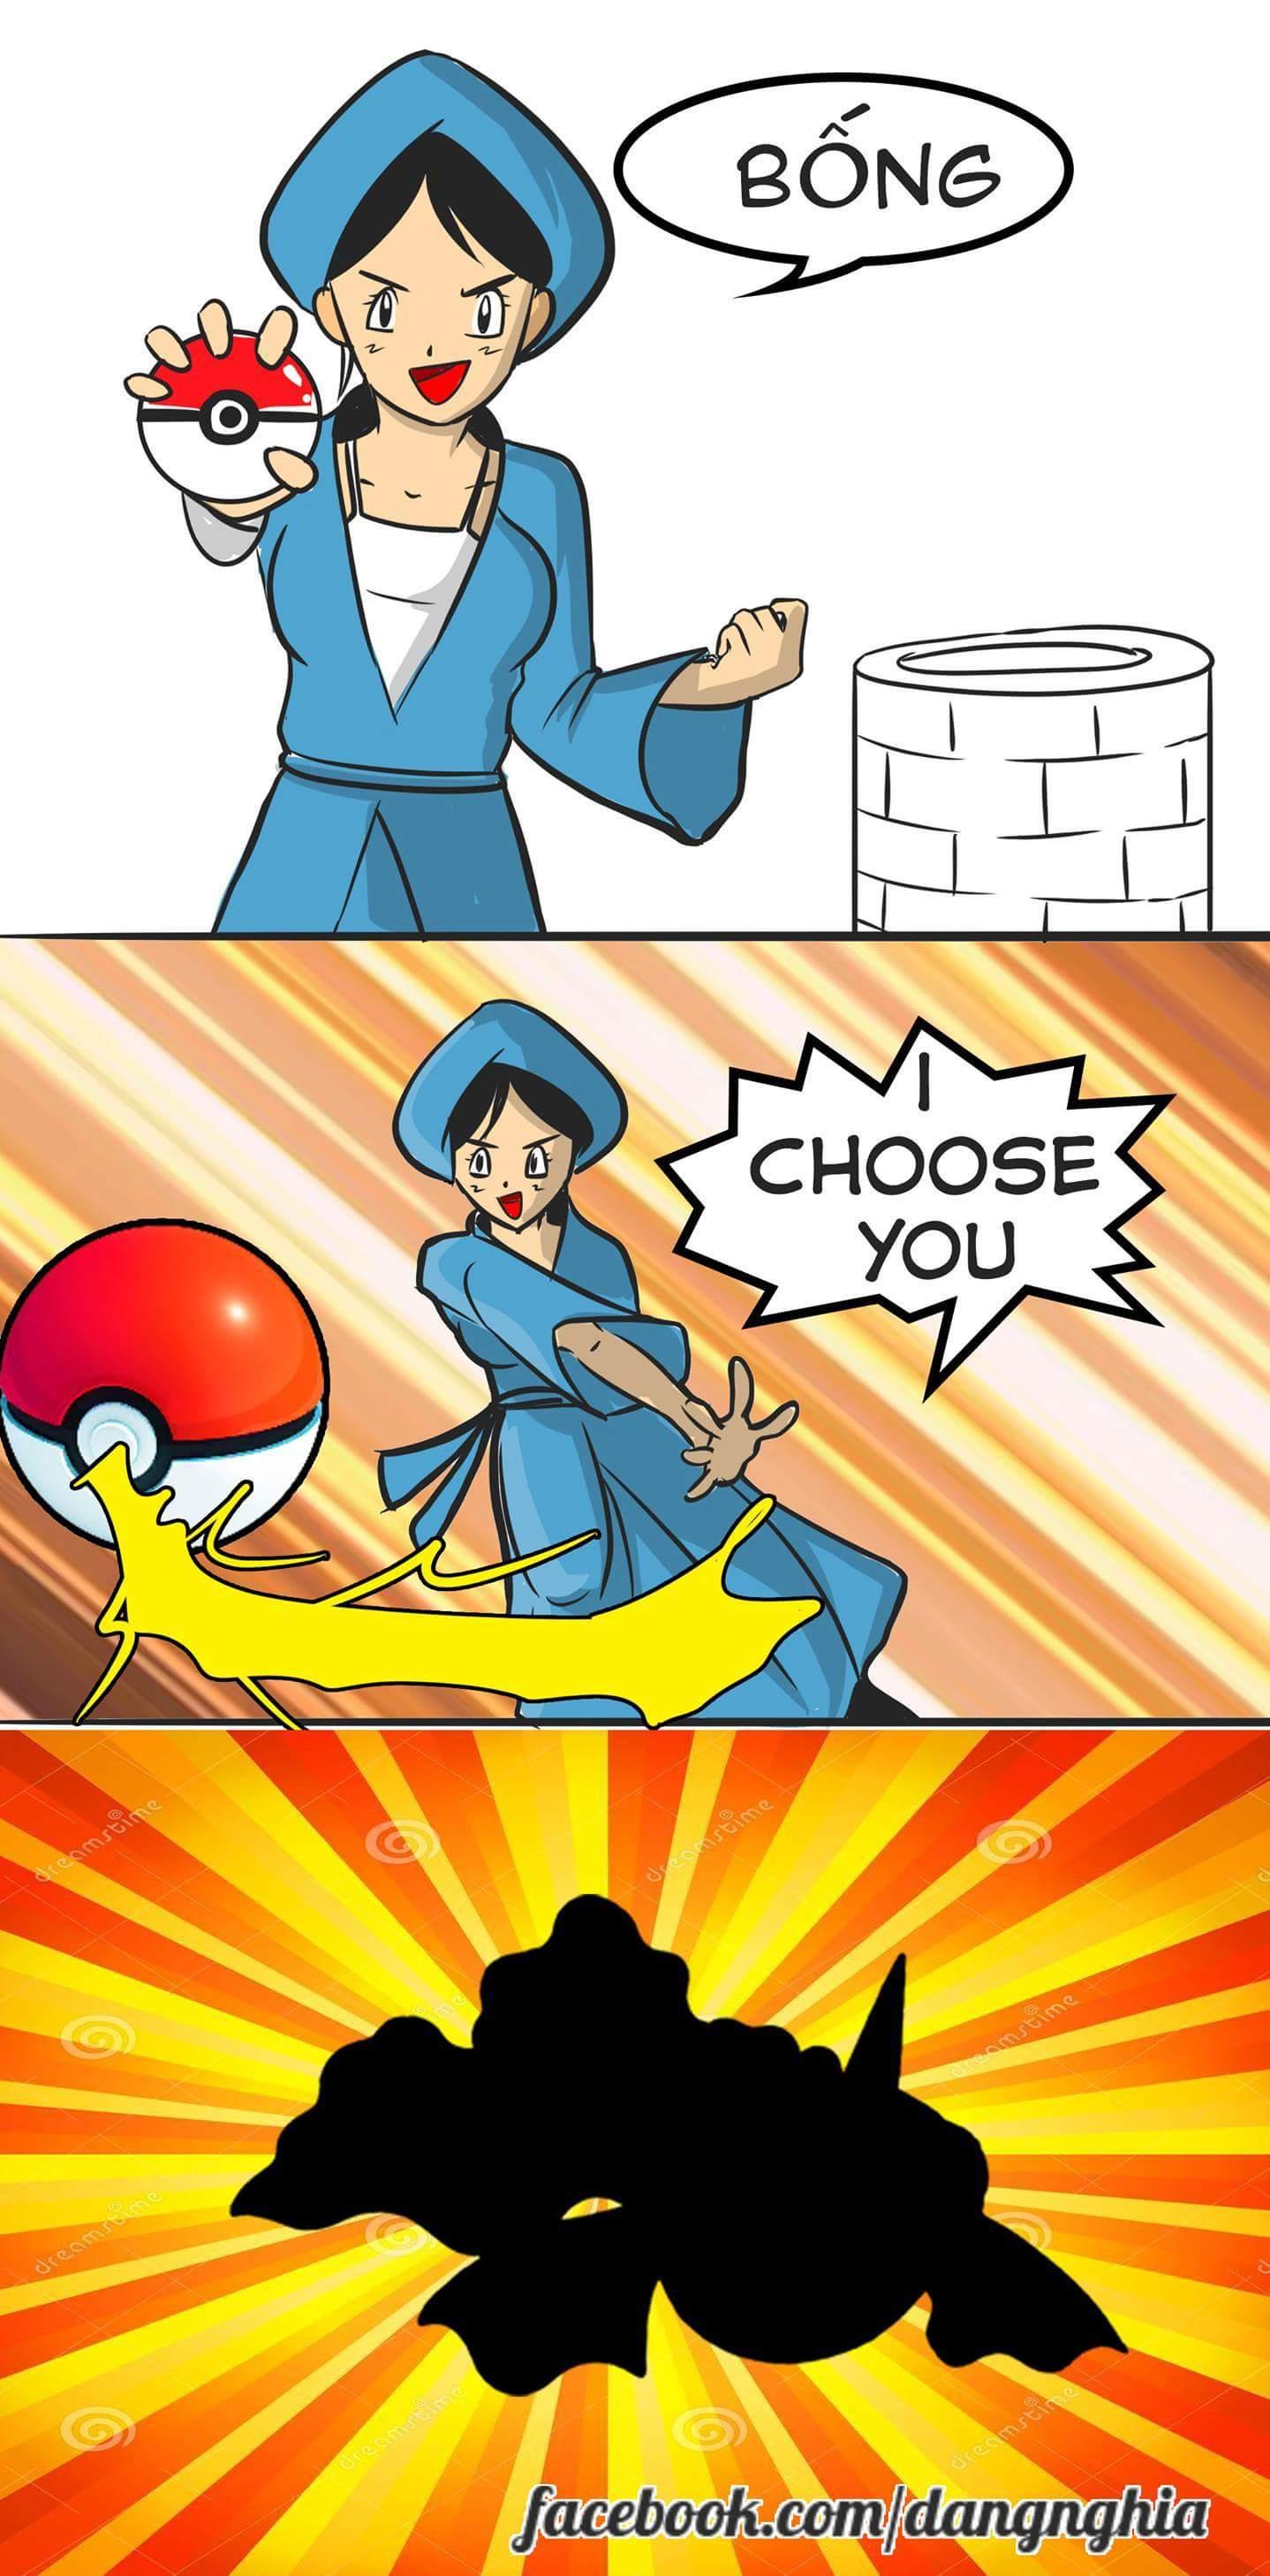 I choose you! :v  Tranh: Minh Nghĩa.